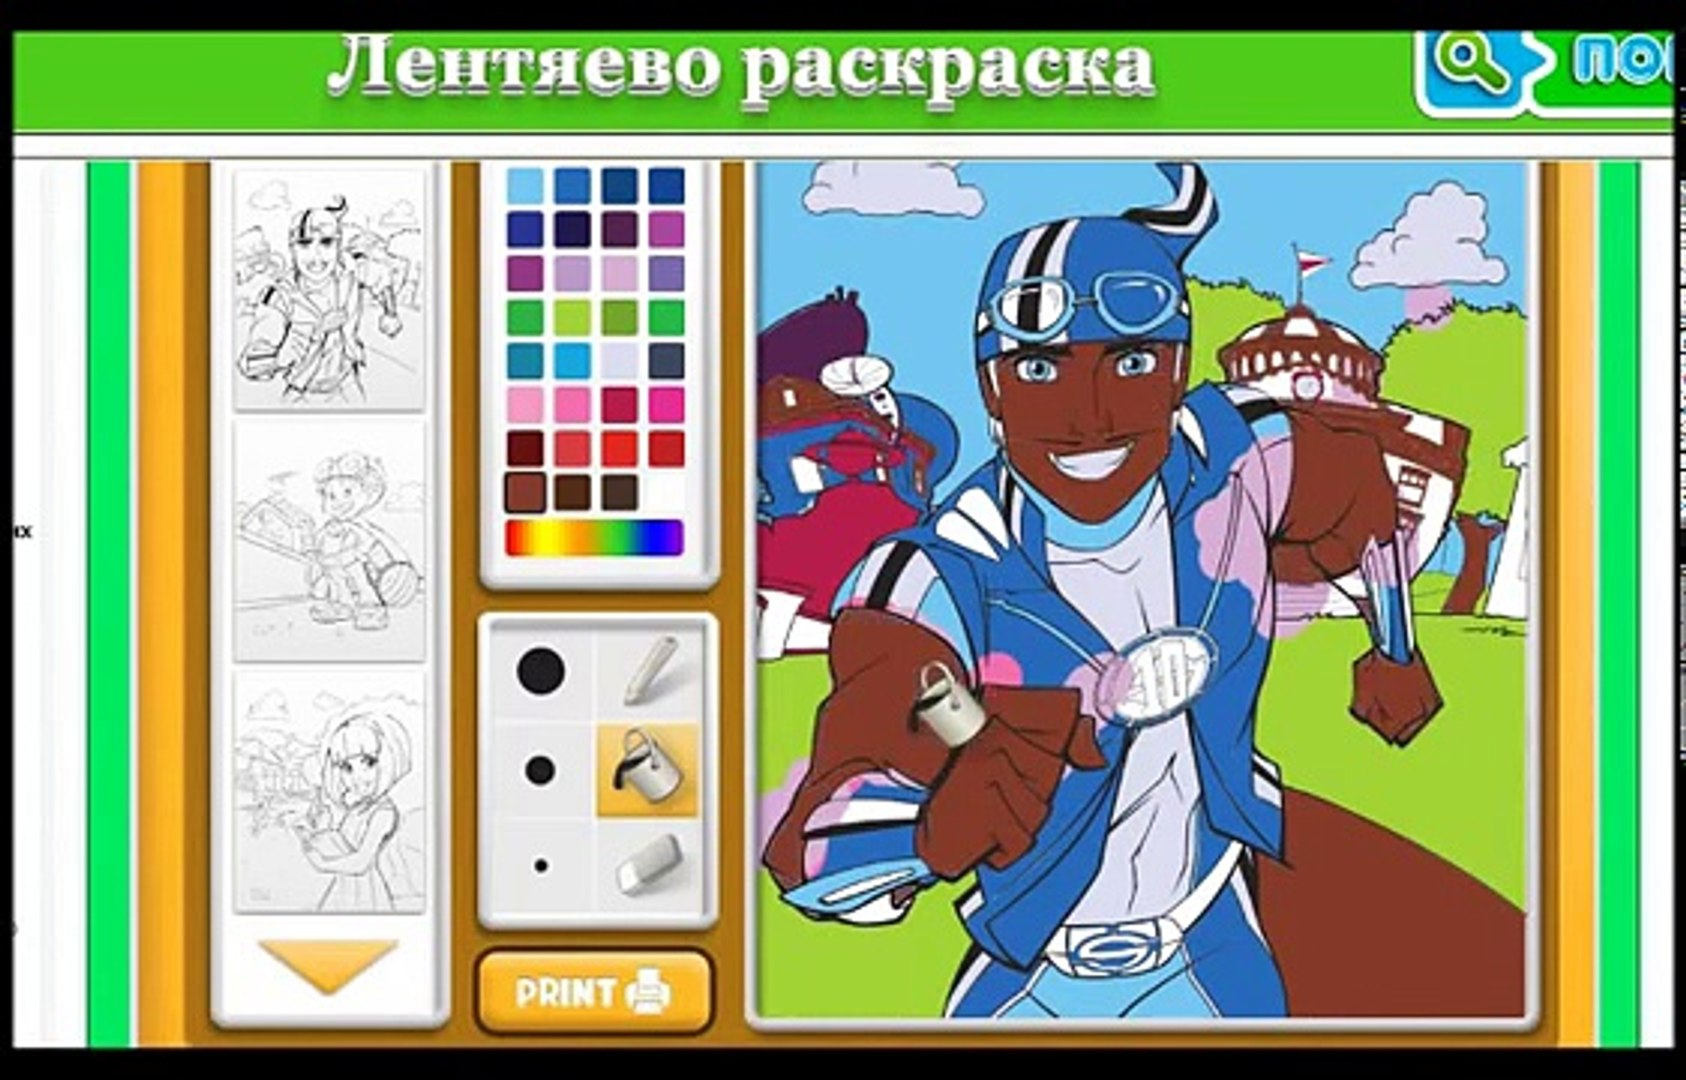 Sportakus Lentyaevo Rasskras Kartinku Sportakus Kids Games Epizod Episode Video Dailymotion